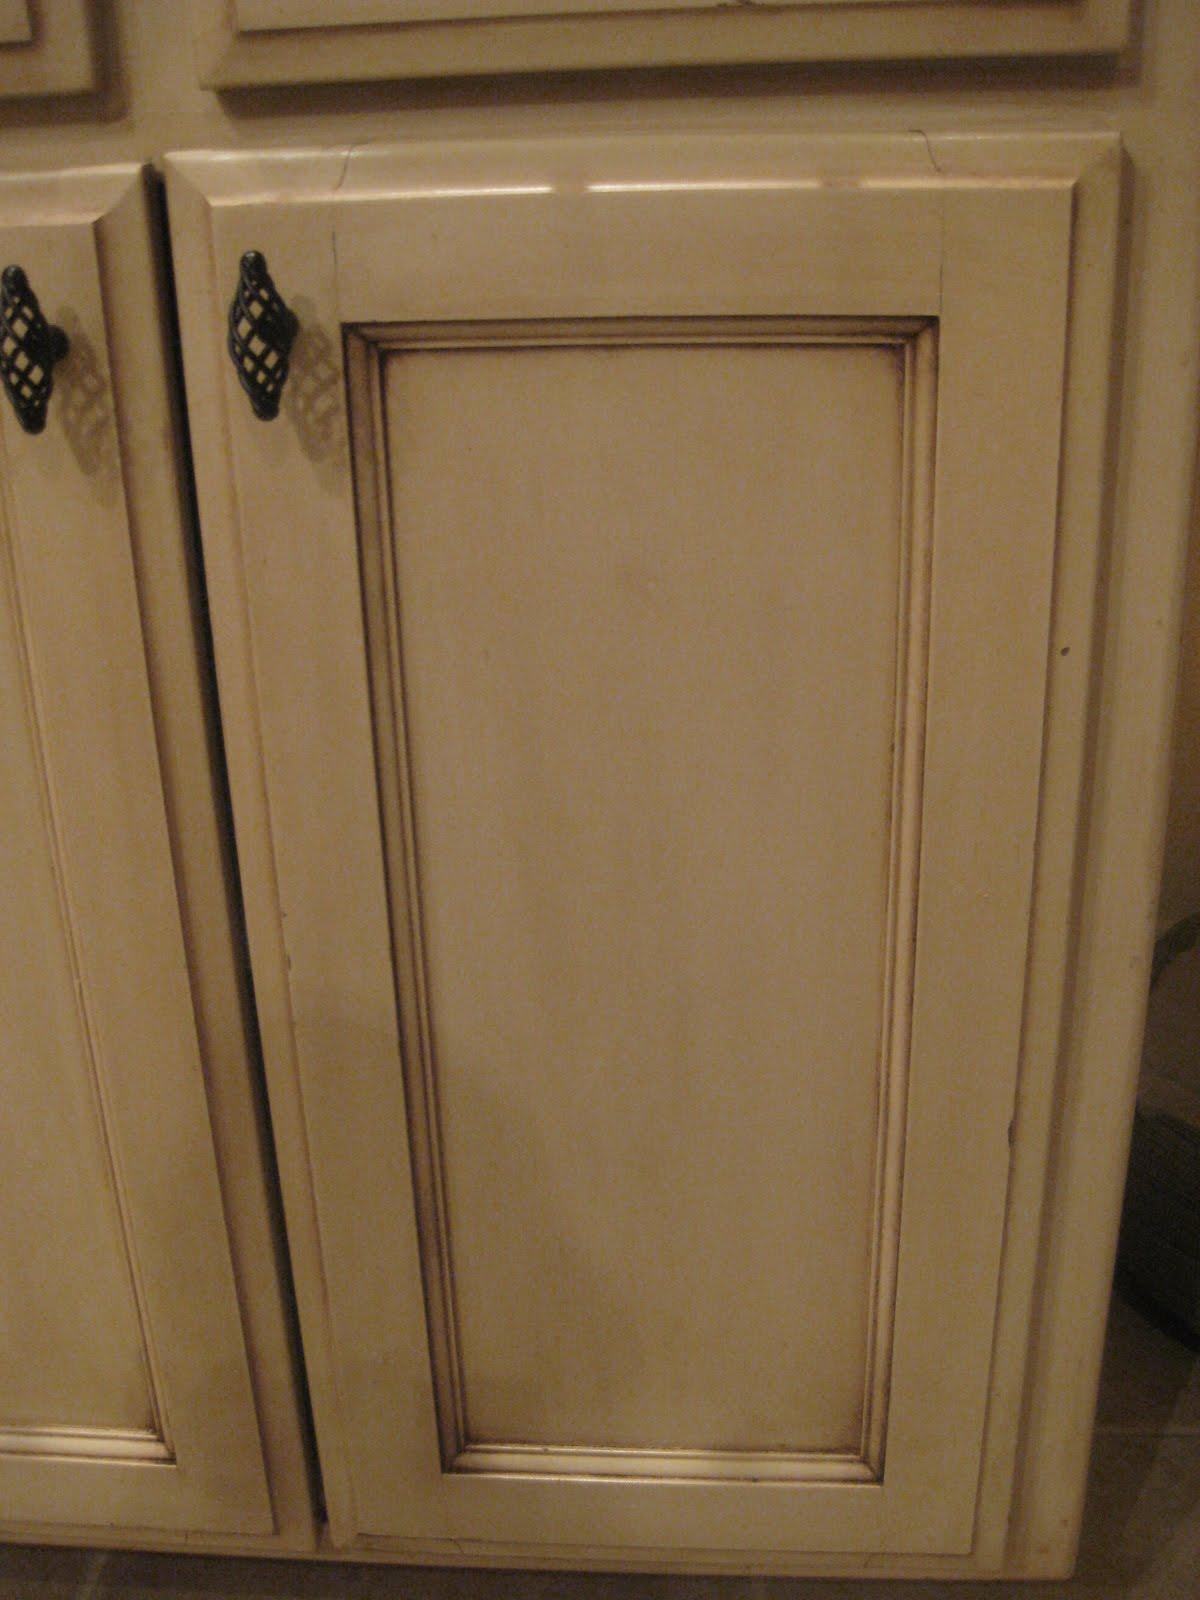 glazed kitchen cabinets aid slide in range kristen 39s creations glazing painted